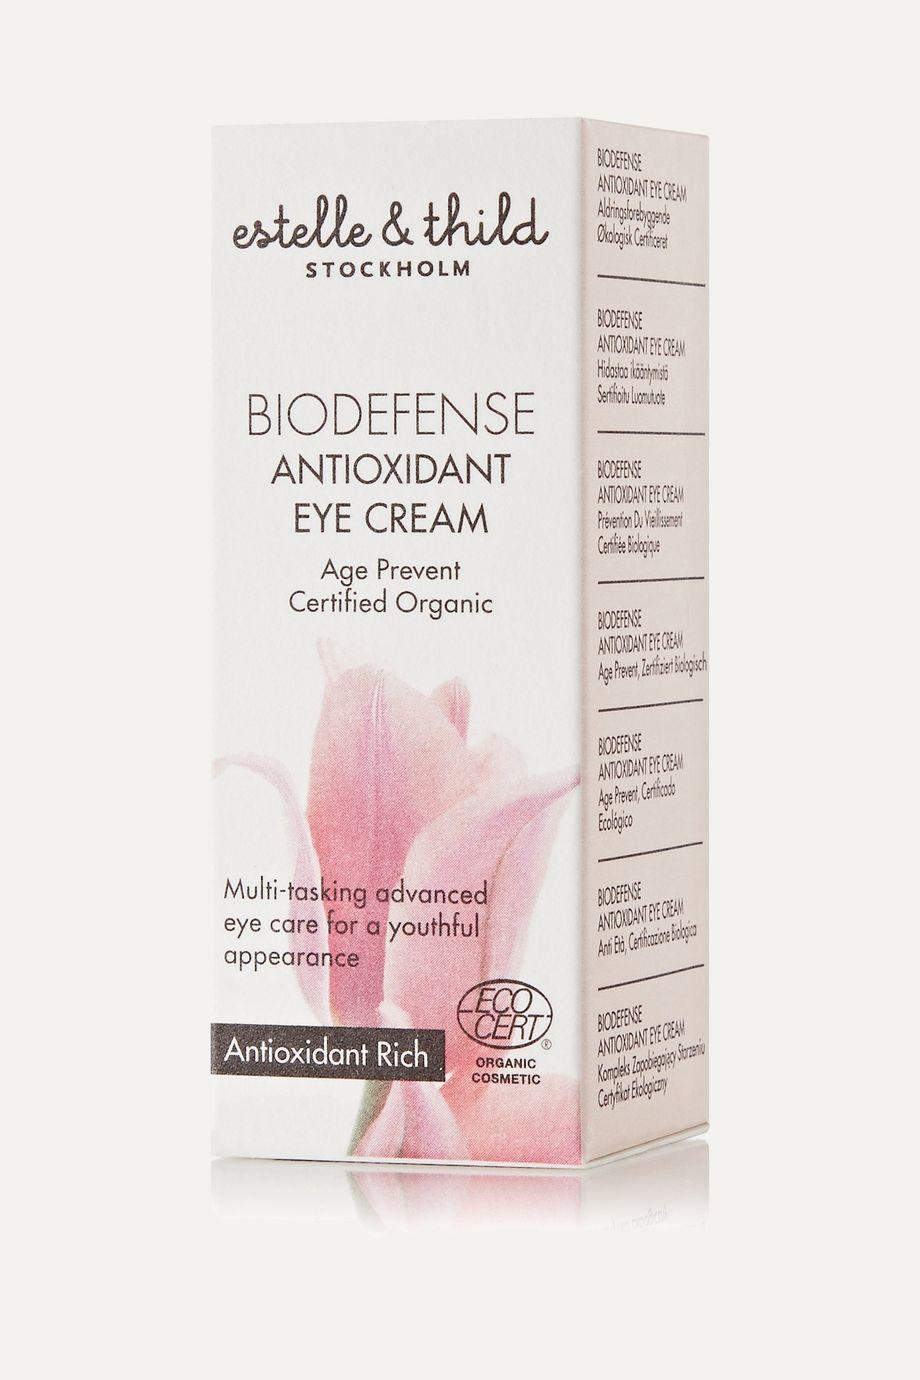 Estelle & Thild BioDefense Antioxidant Eye Cream, 15ml